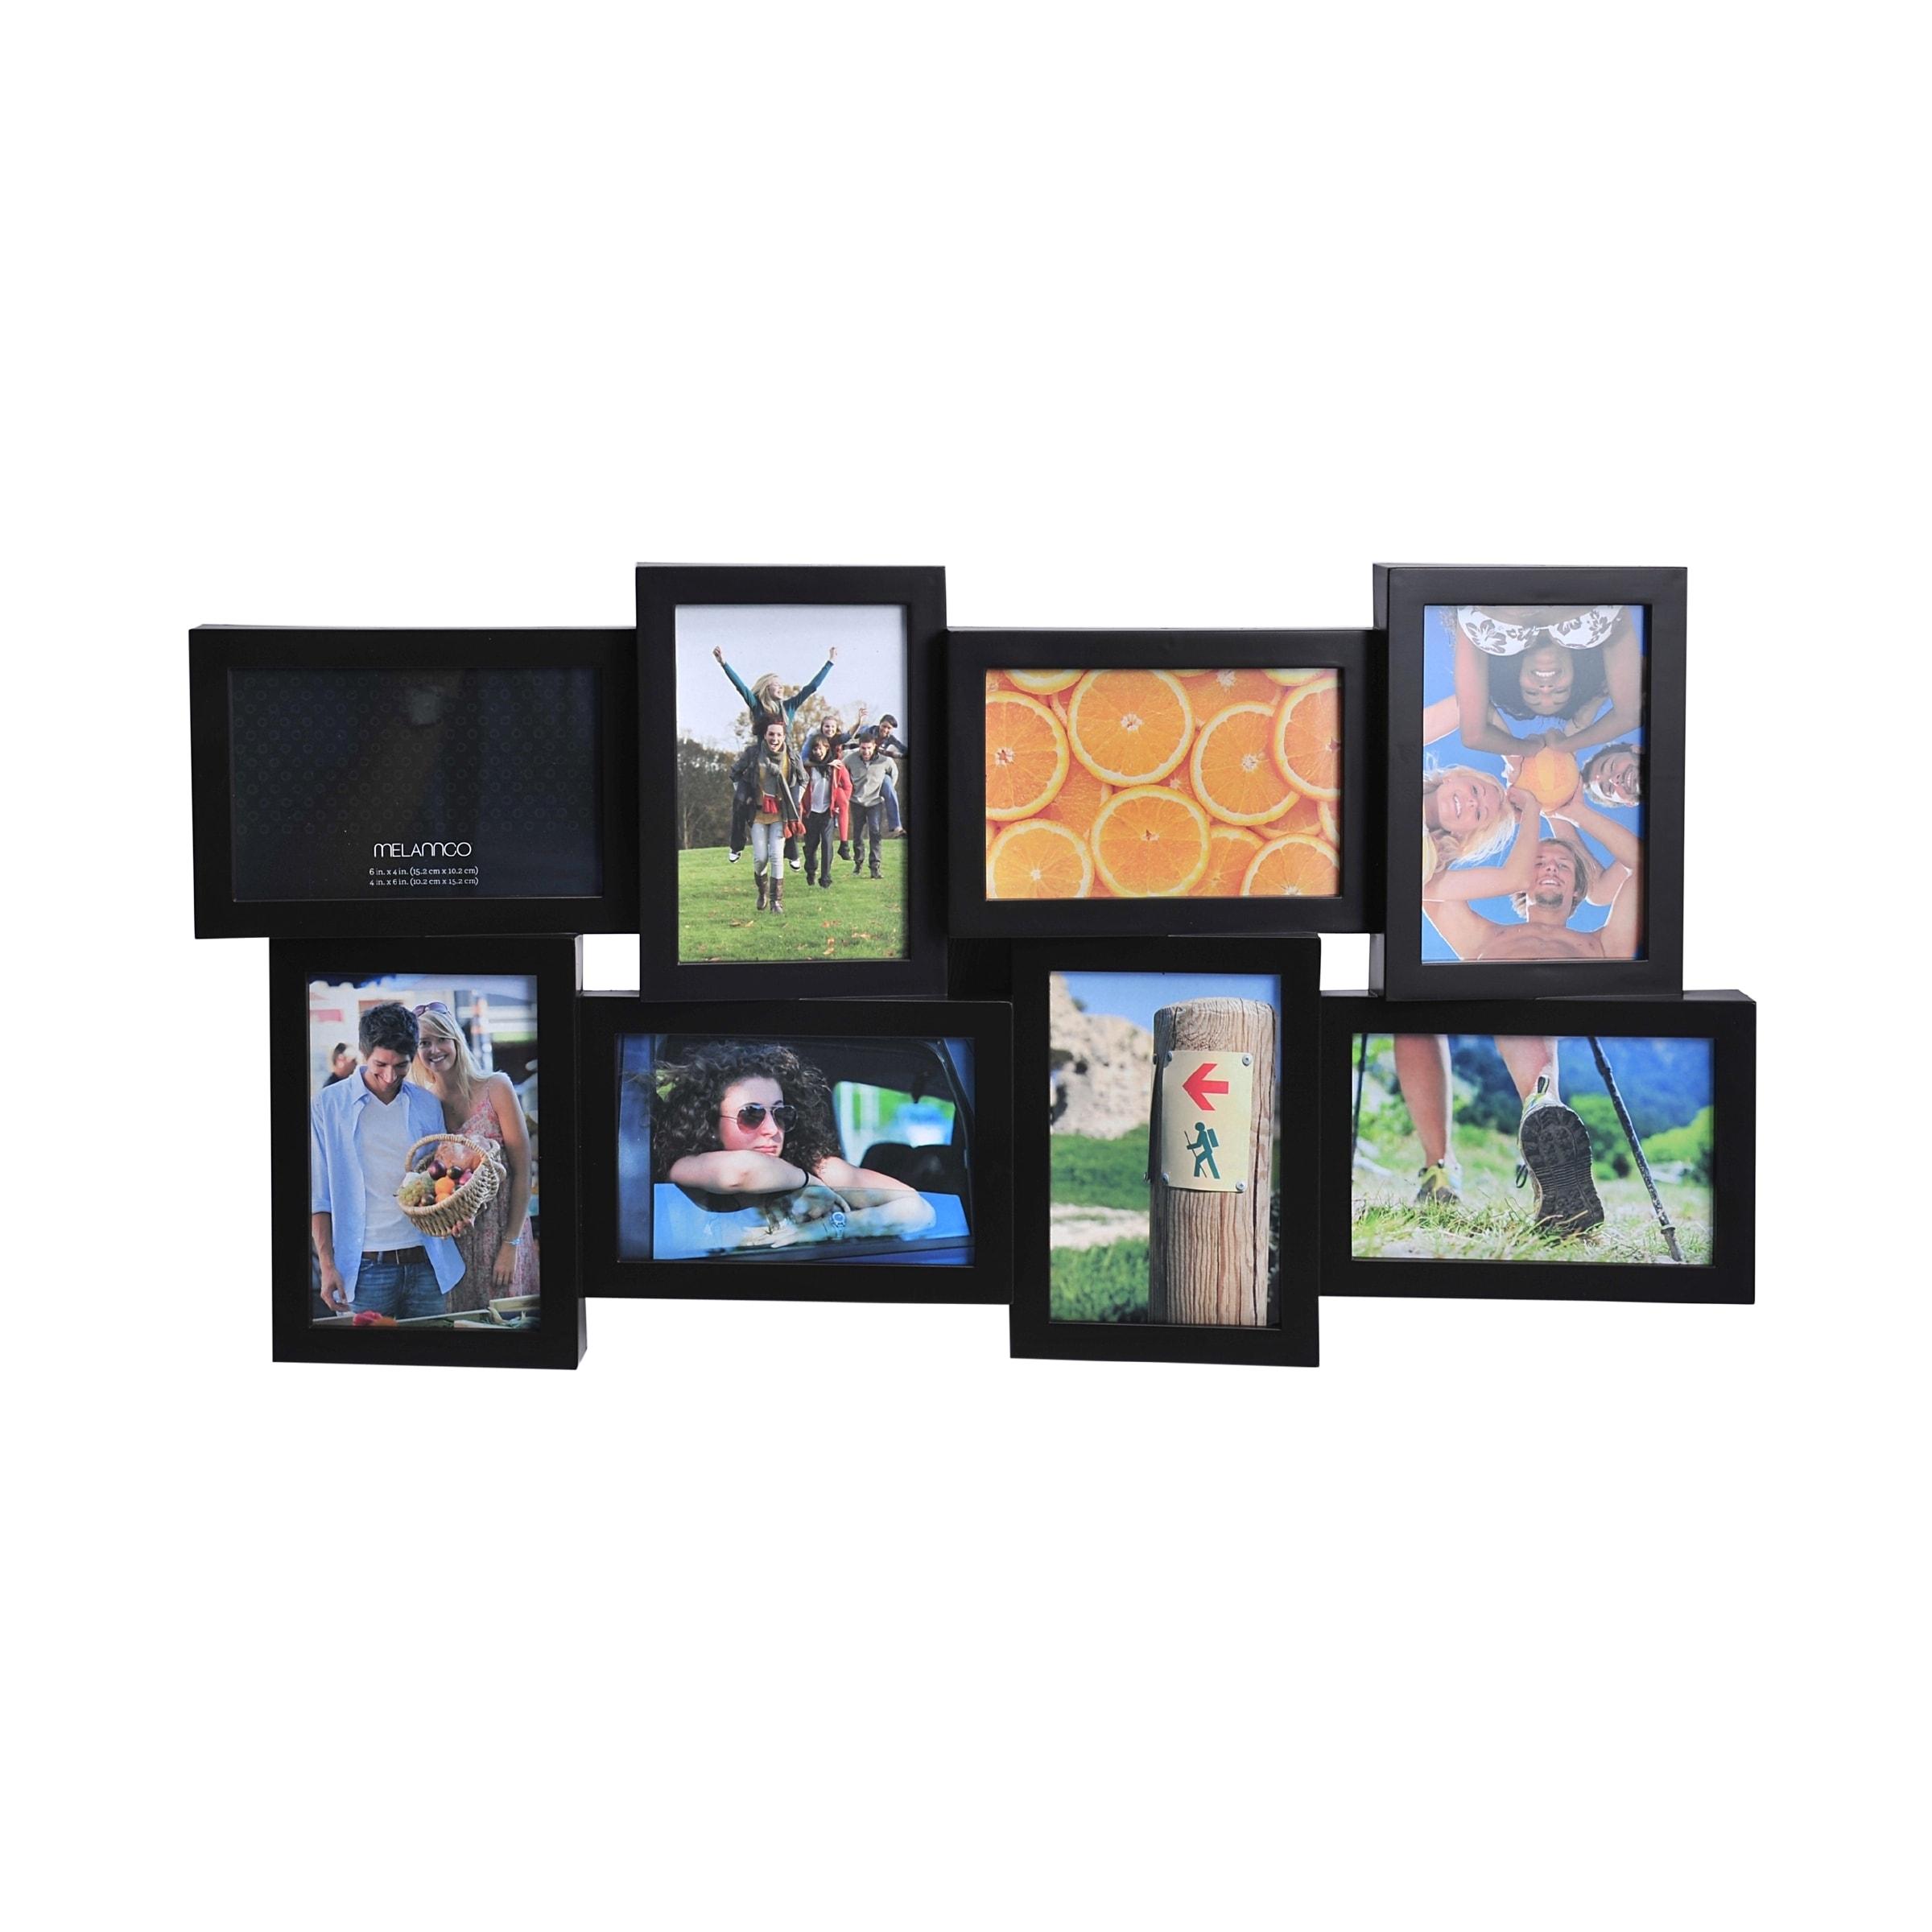 Magnificent Melannco Collage Frame Photo - Framed Art Ideas ...